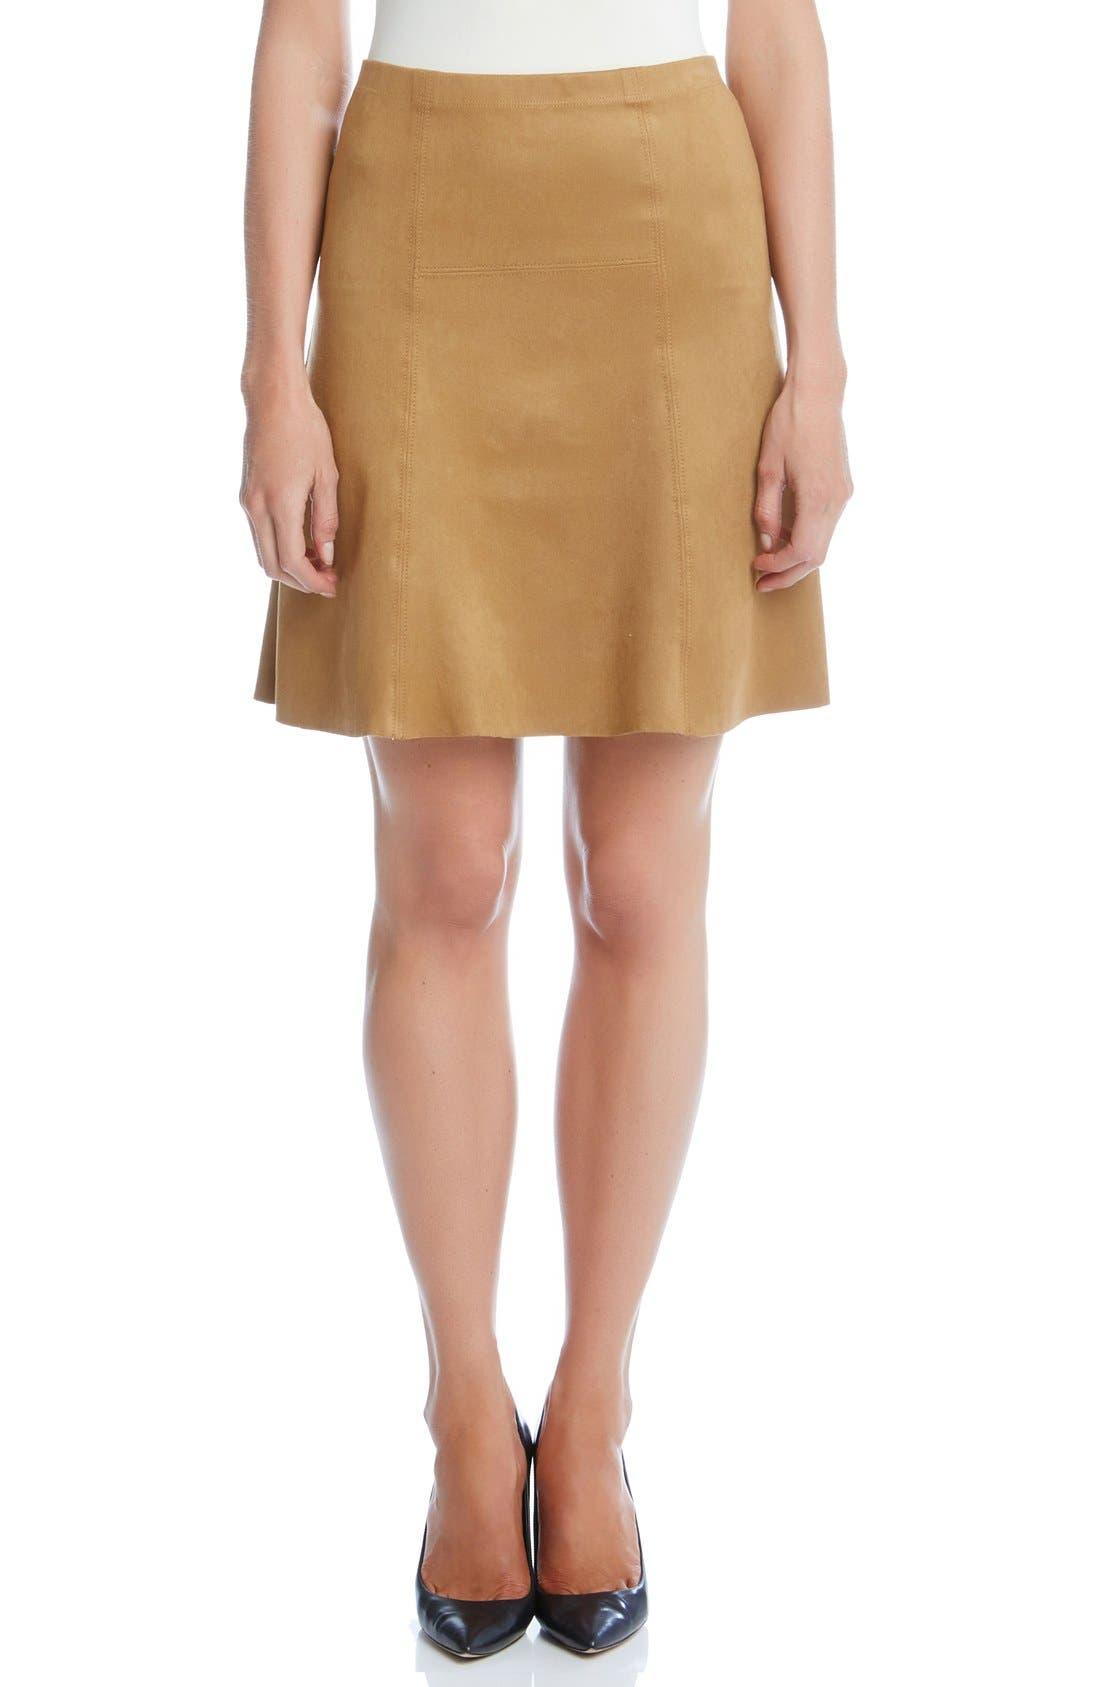 Alternate Image 1 Selected - Karen Kane Flared Faux Suede Knit Skirt